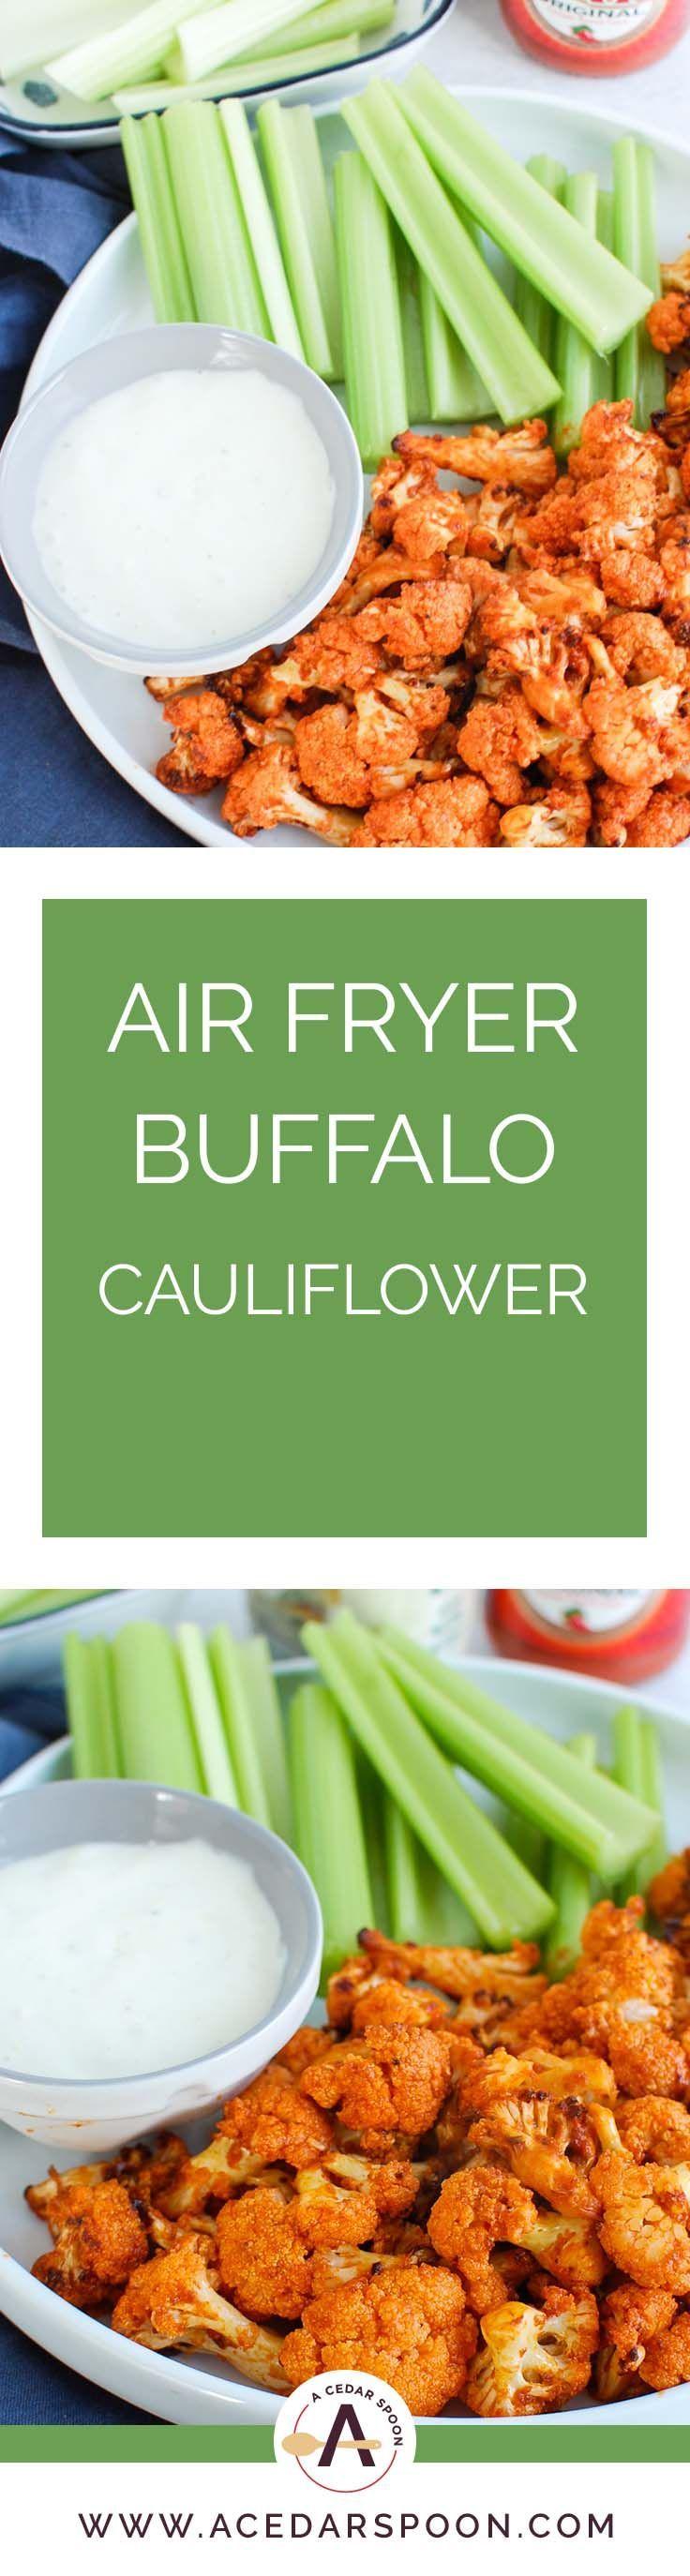 Air Fryer Buffalo Cauliflower Recipe Spicy vegetarian